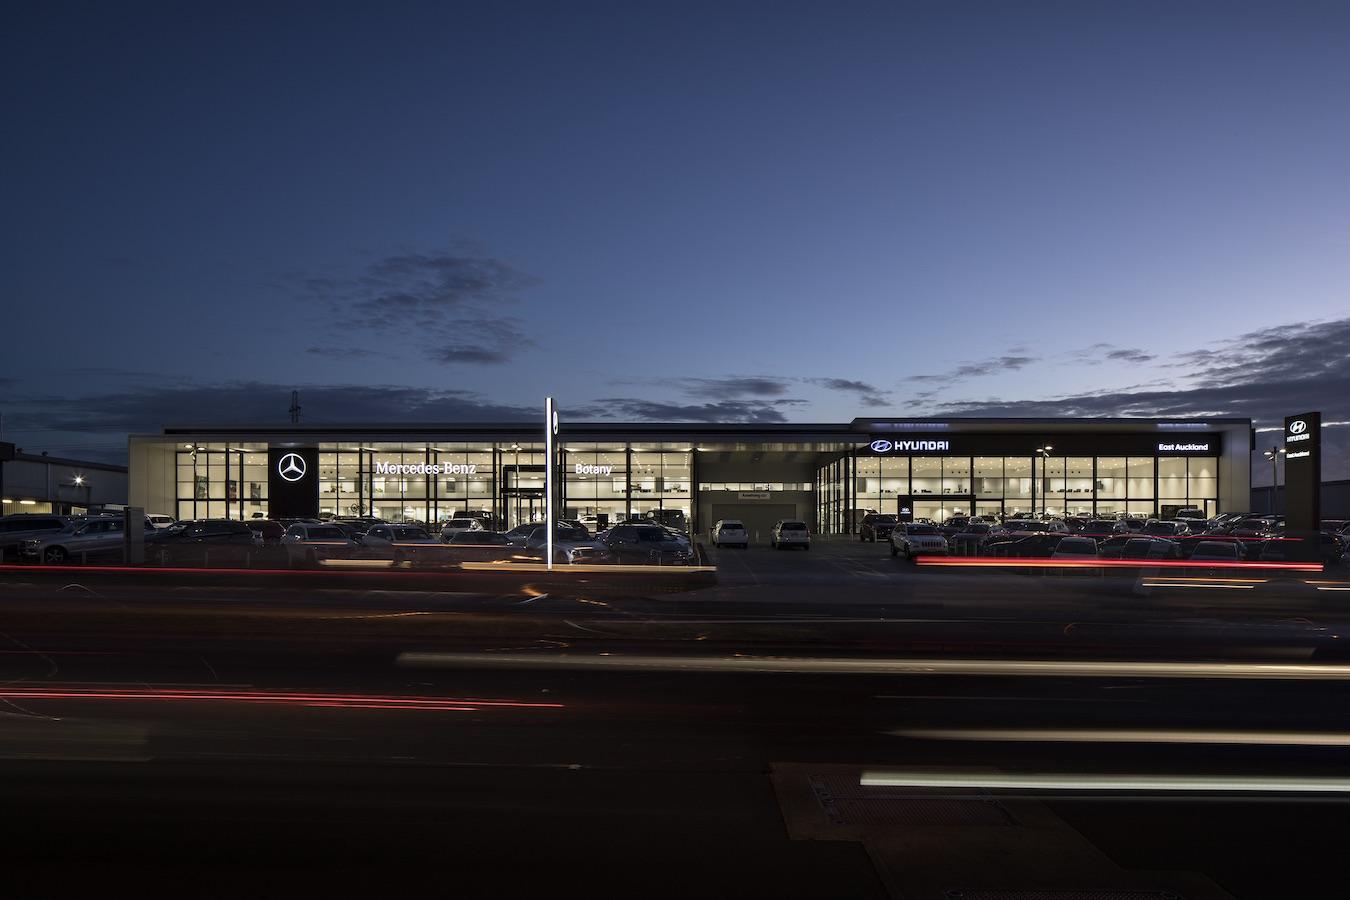 Mercedes Benz & Hyundai Botany. Botany Auckland